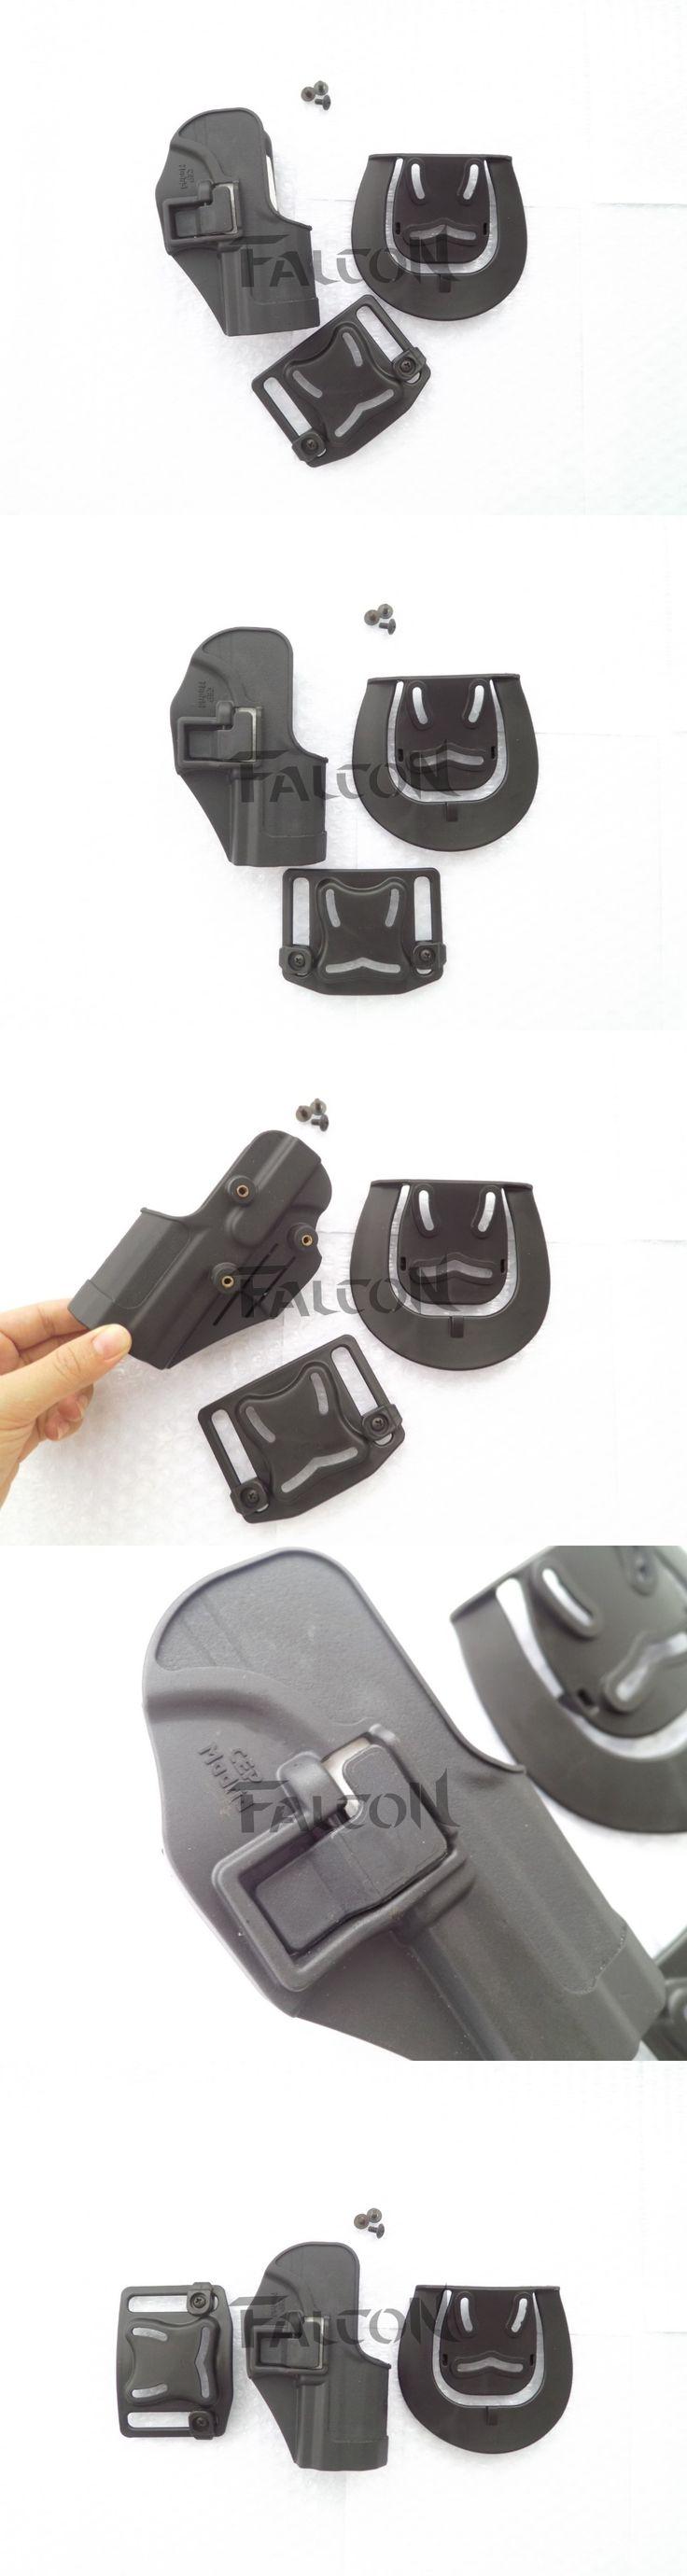 Blackhawk CQC HK USP Compact Right Hand Gun  Holster Tactical Airsoft RH  pistol Holster